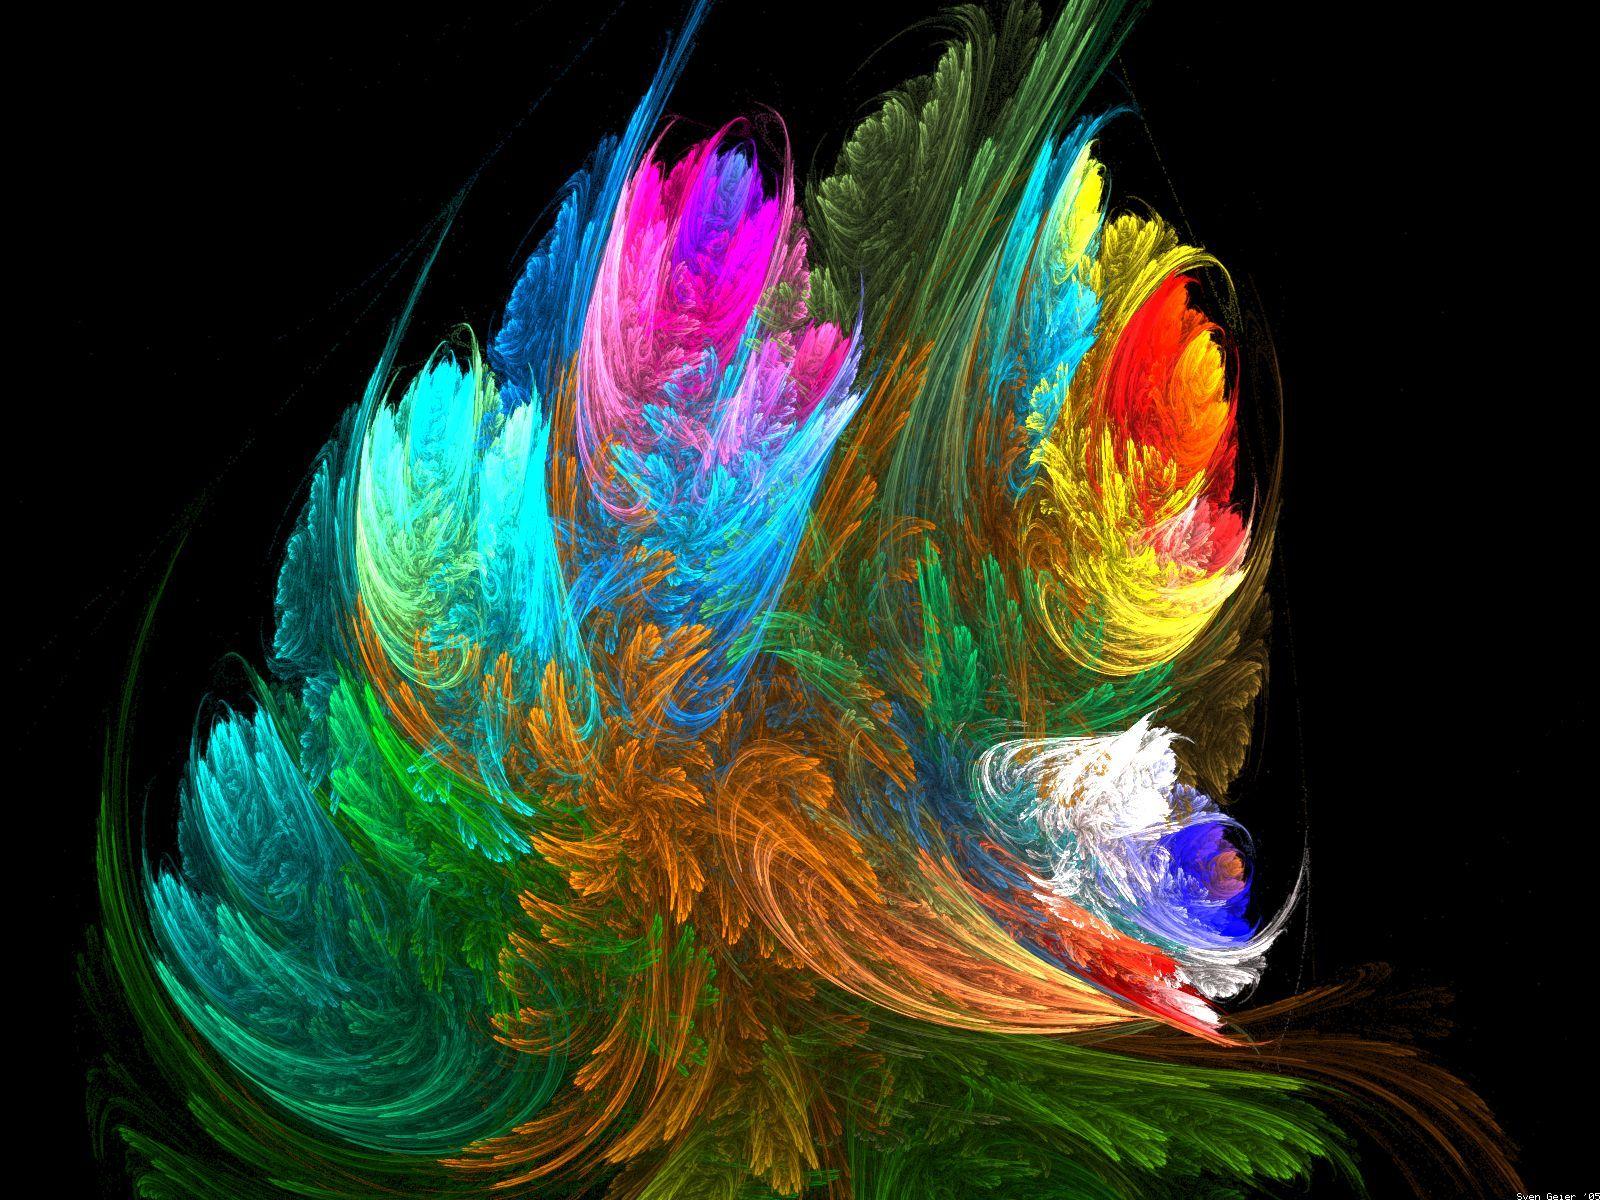 http://3.bp.blogspot.com/-py4kHpcc1WE/UNBO-mEur3I/AAAAAAABCSc/B6m_cL6xKwo/s1600/bm-image-785406.jpeg